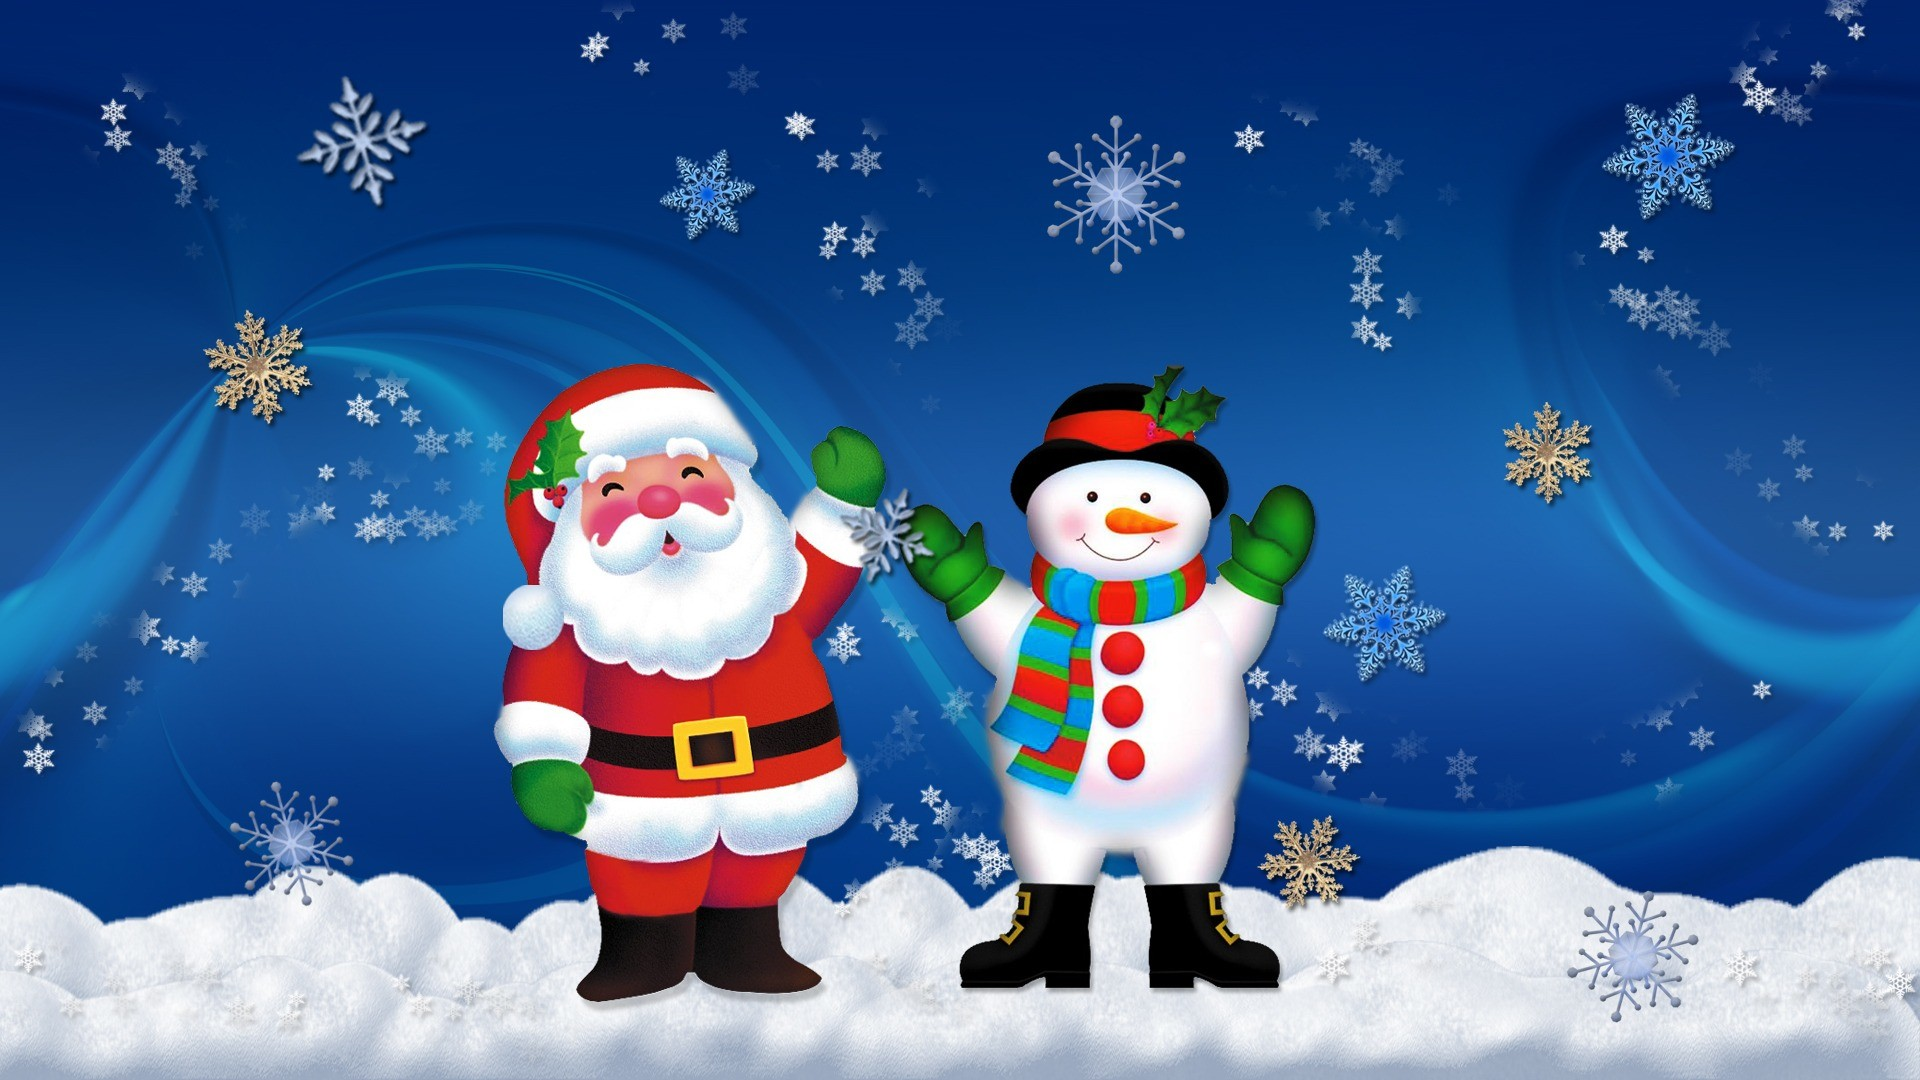 Sfondi Natalizi Mac.Sfondi Hd Natale 59 Immagini